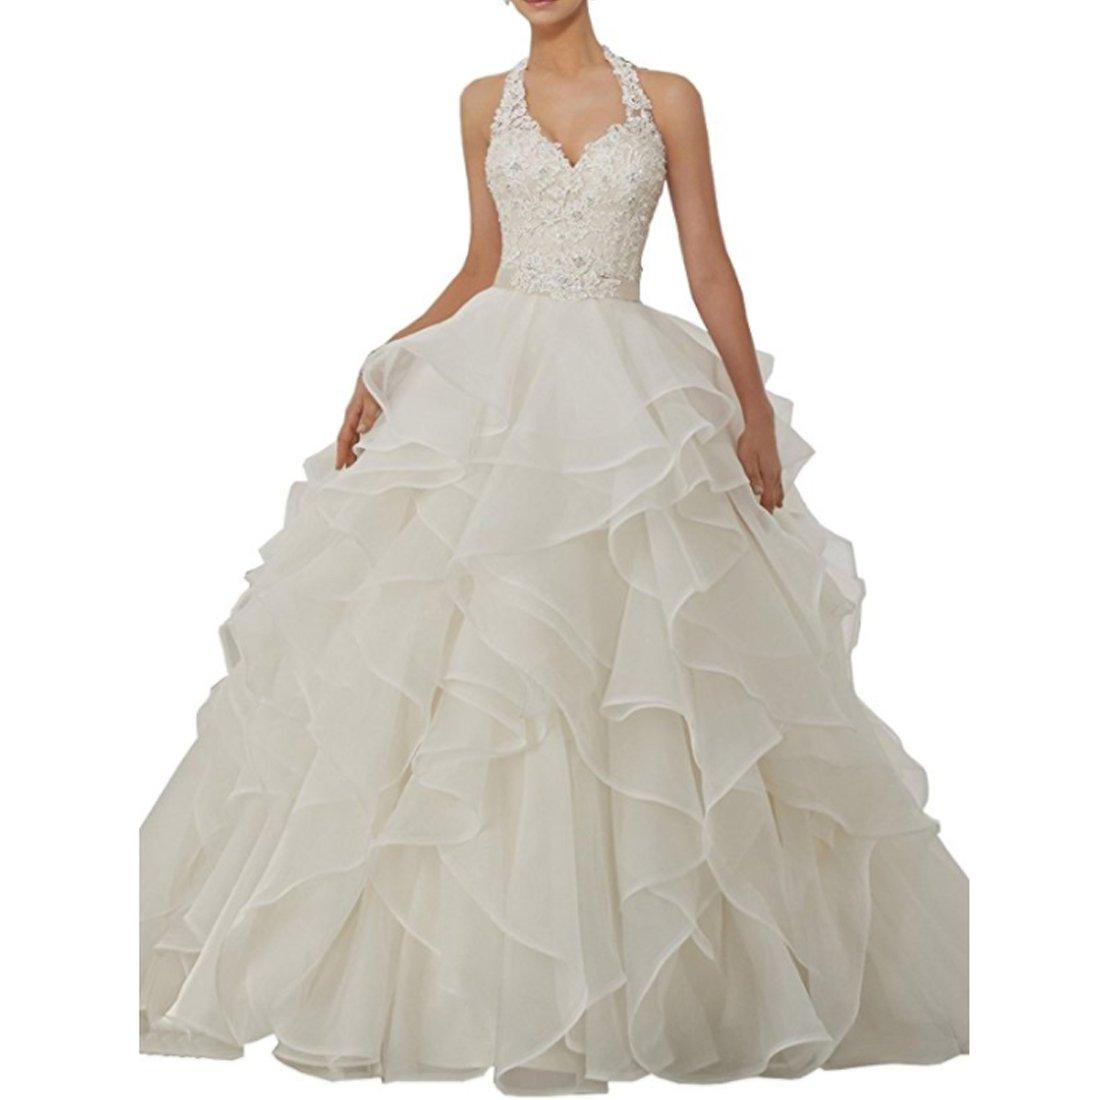 Chady Gorgeous V Neck Organza Ruffles Princess Ball Gown Wedding